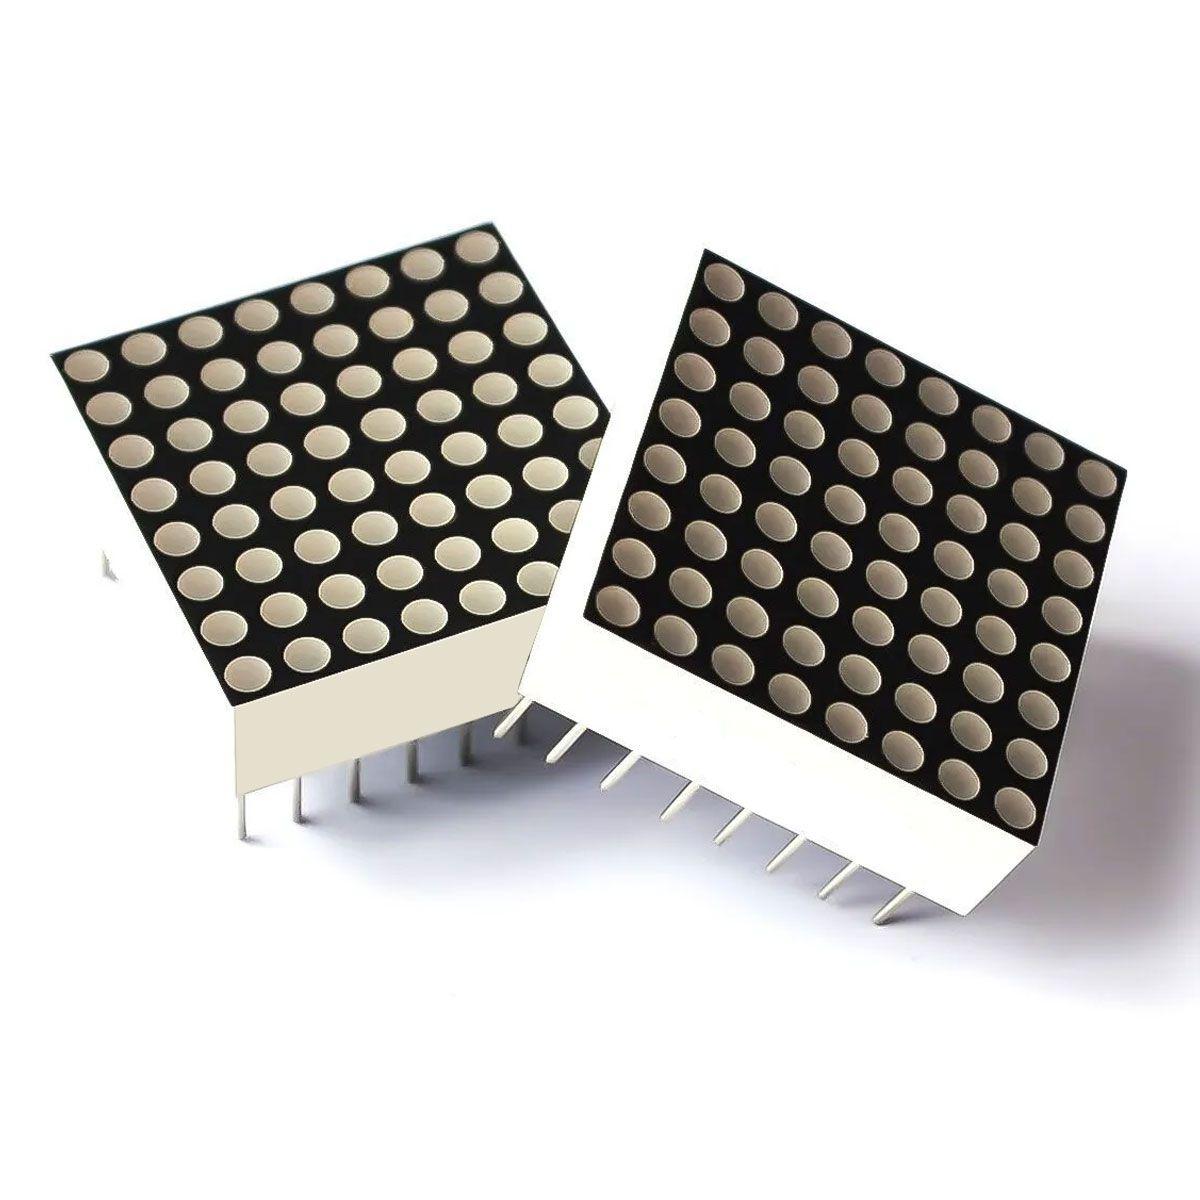 Mini Matriz de LED 8x8 20mm x 20mm - Cor Vermelha - Catodo Comum